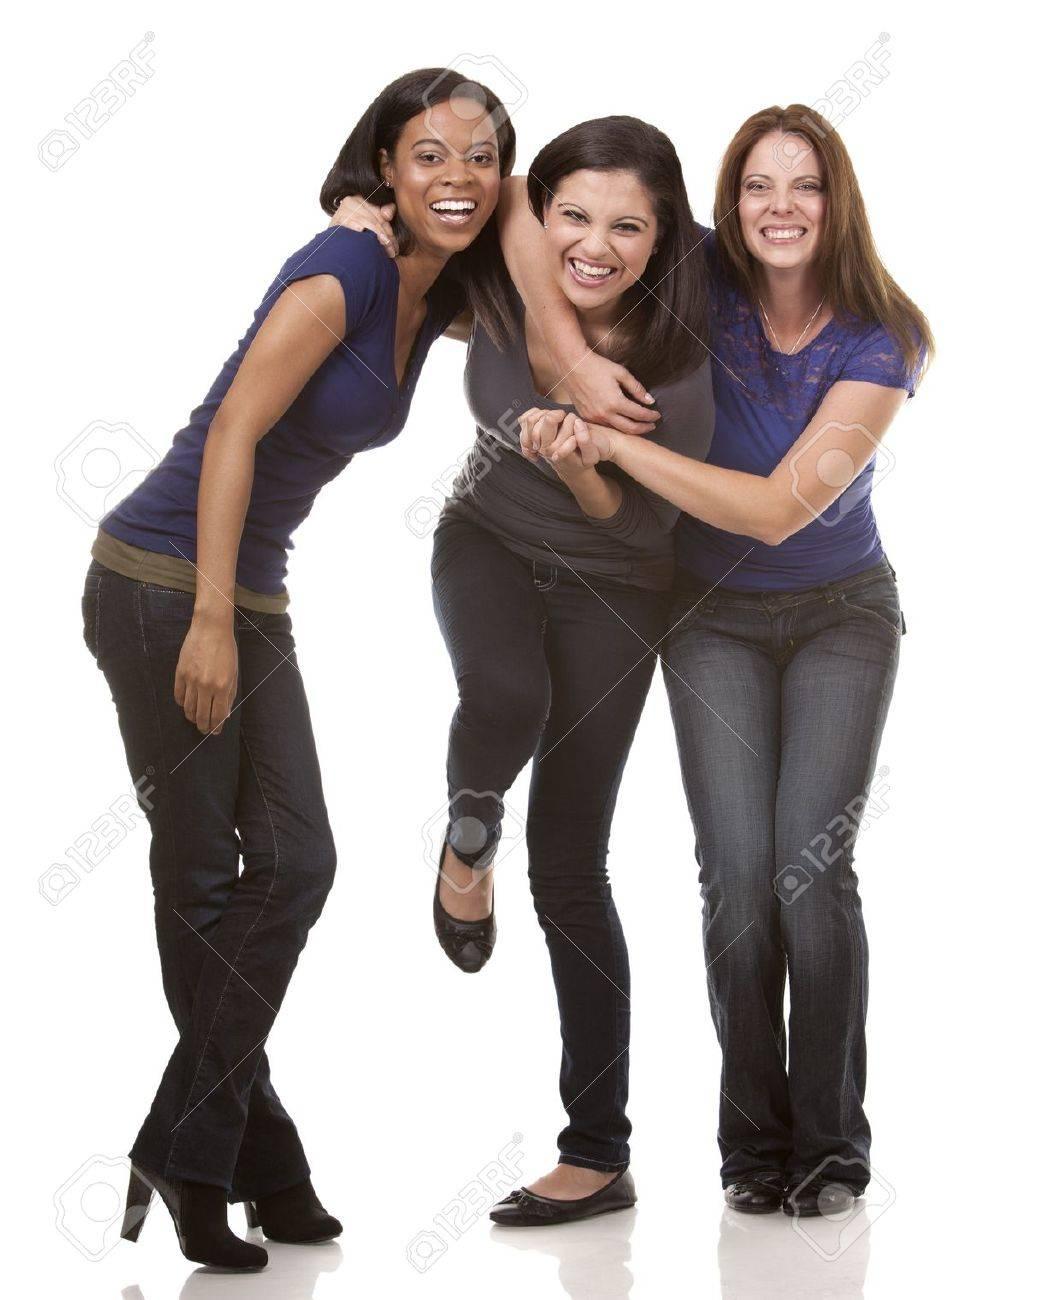 beautiful three women having fun on white isolated background Standard-Bild - 21588239